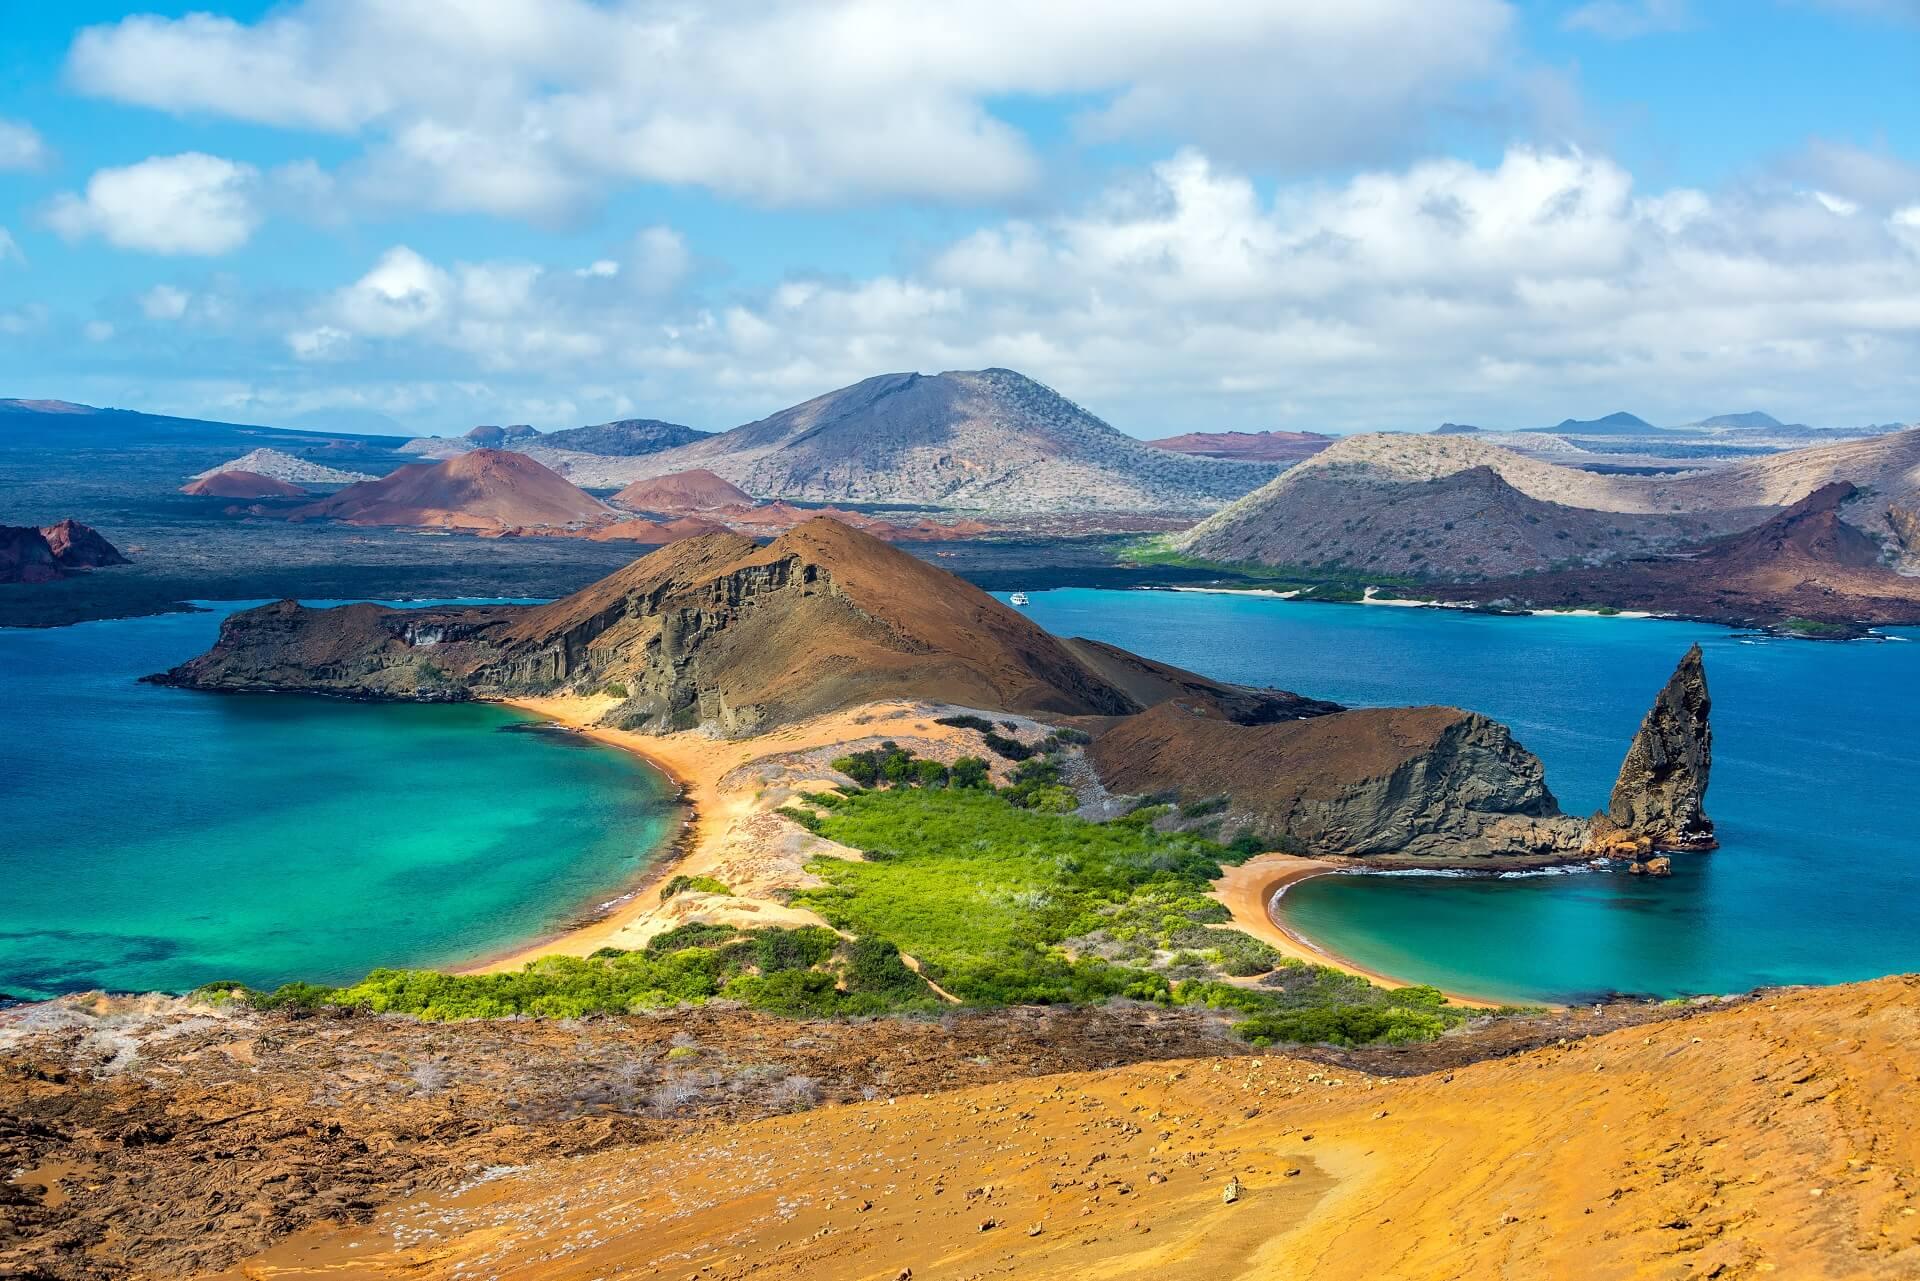 איי גלפאגוס